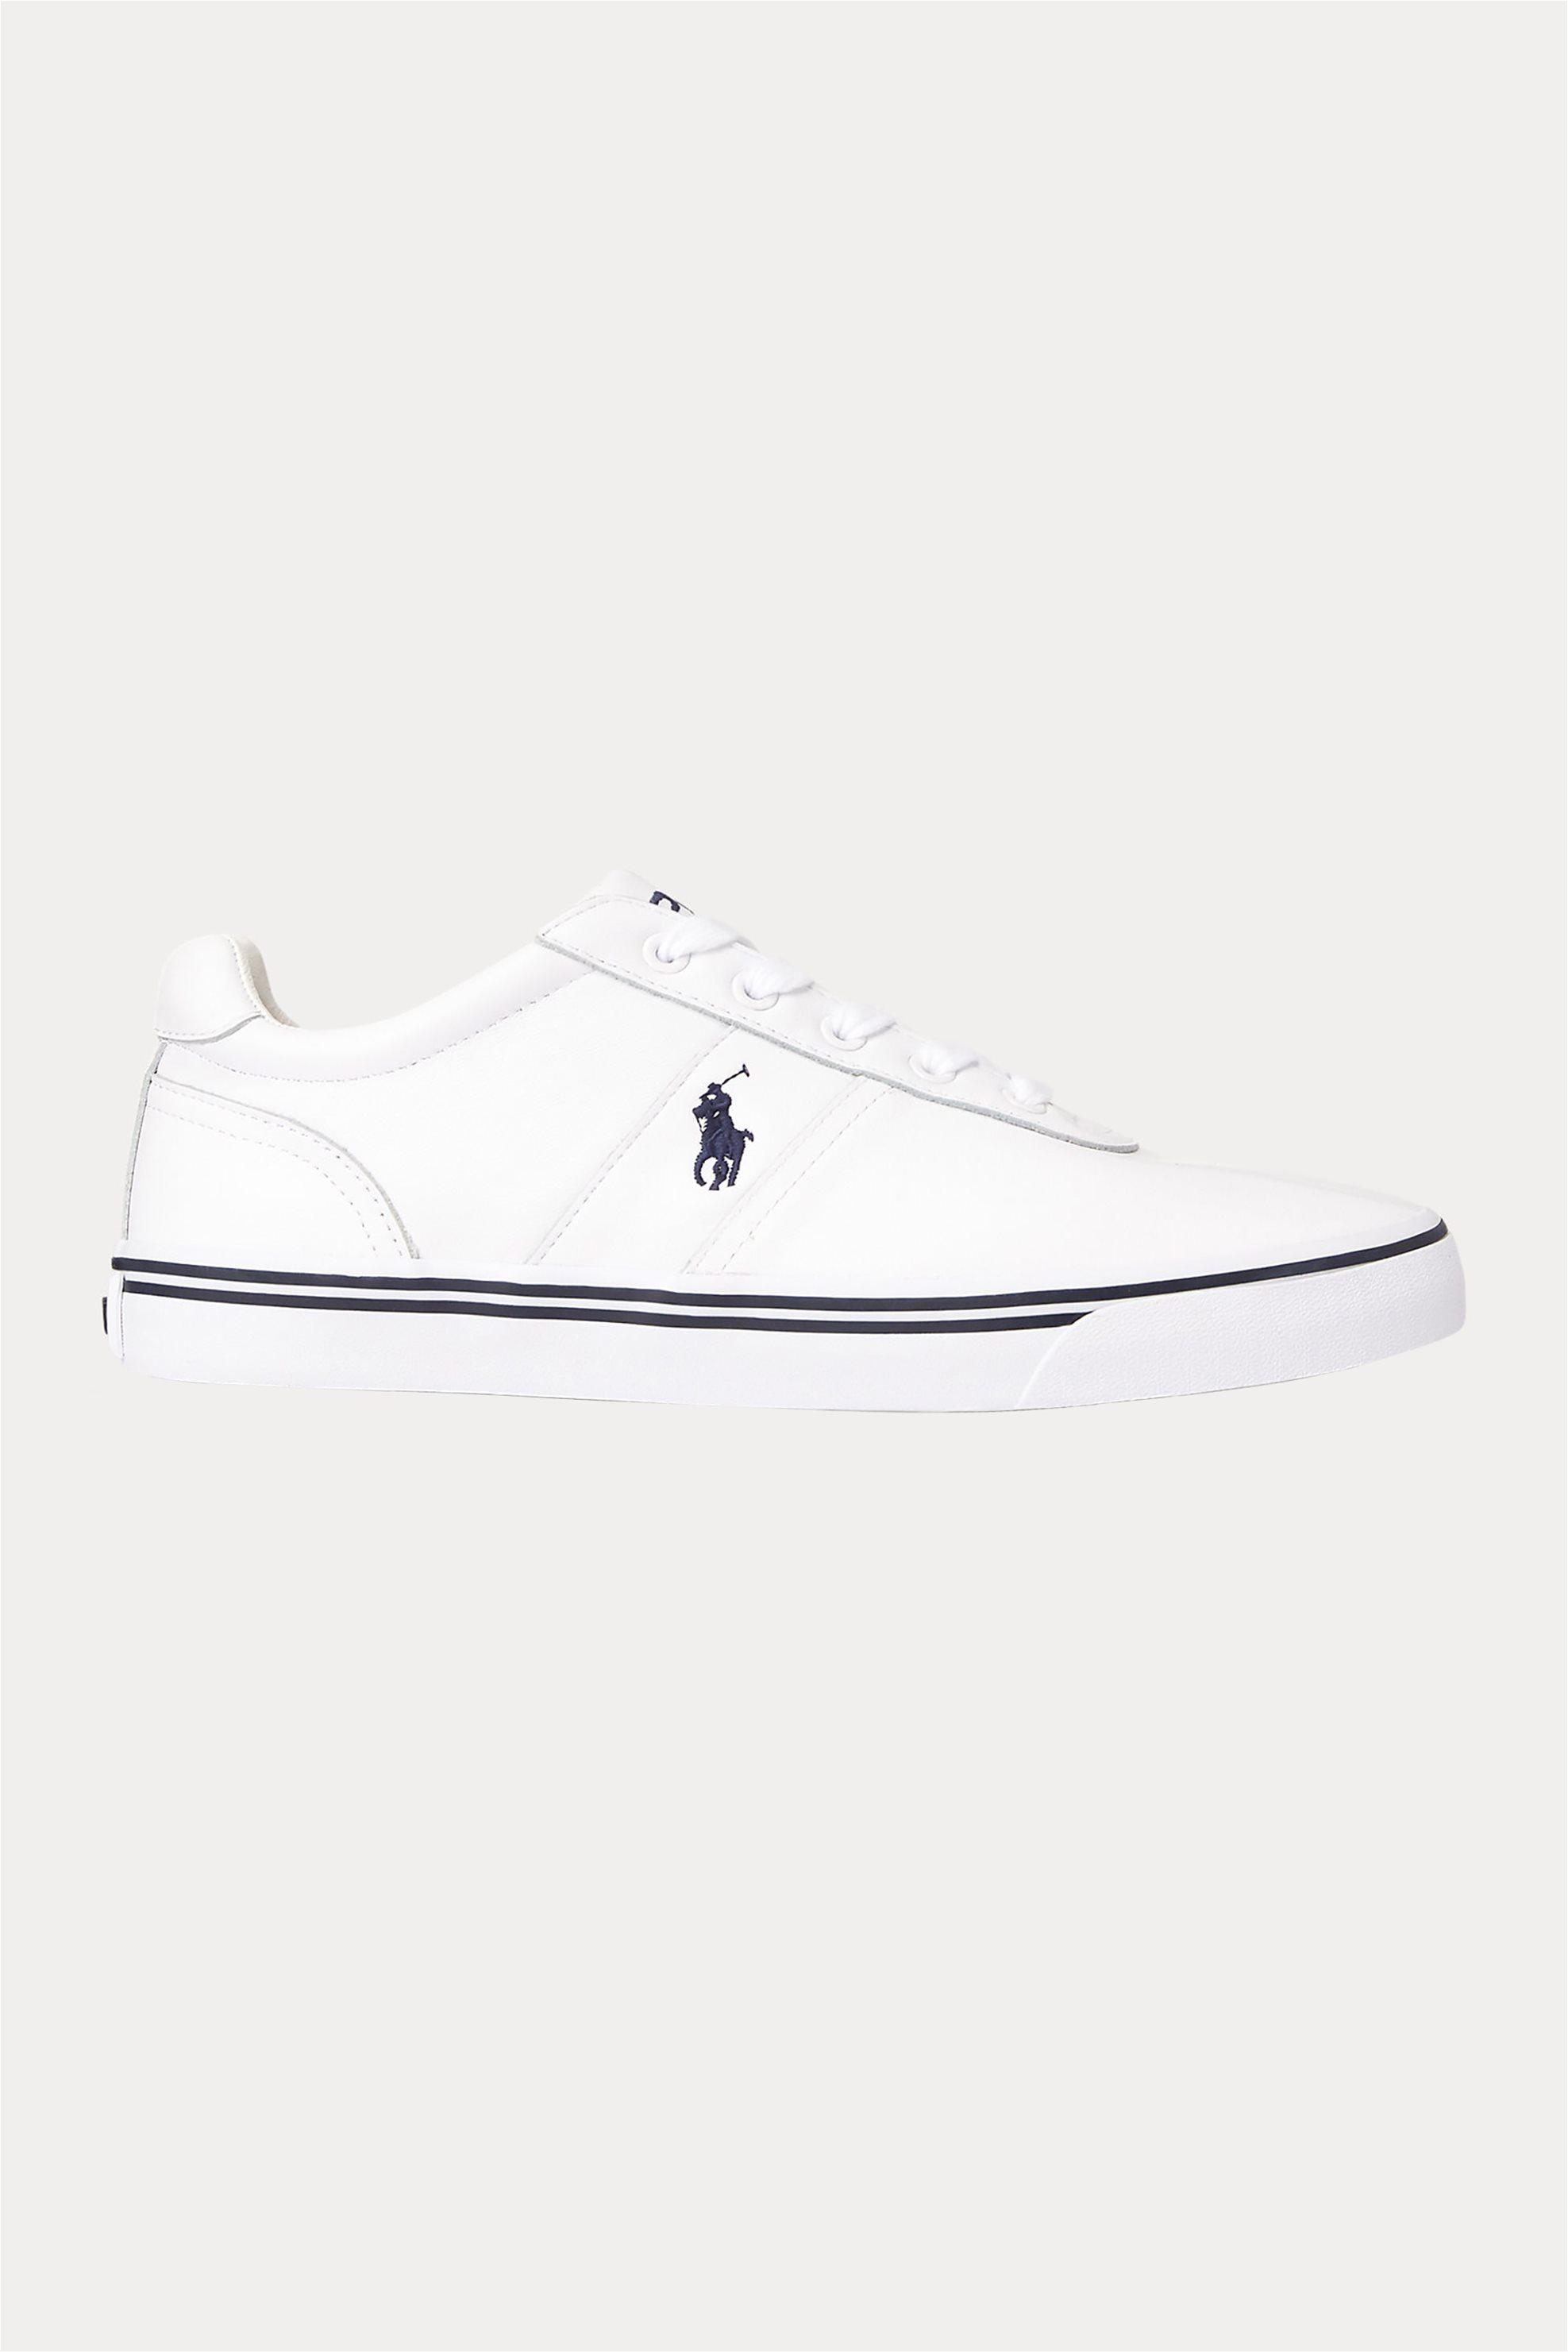 Polo Ralph Lauren ανδρικά δερμάτινα sneakers